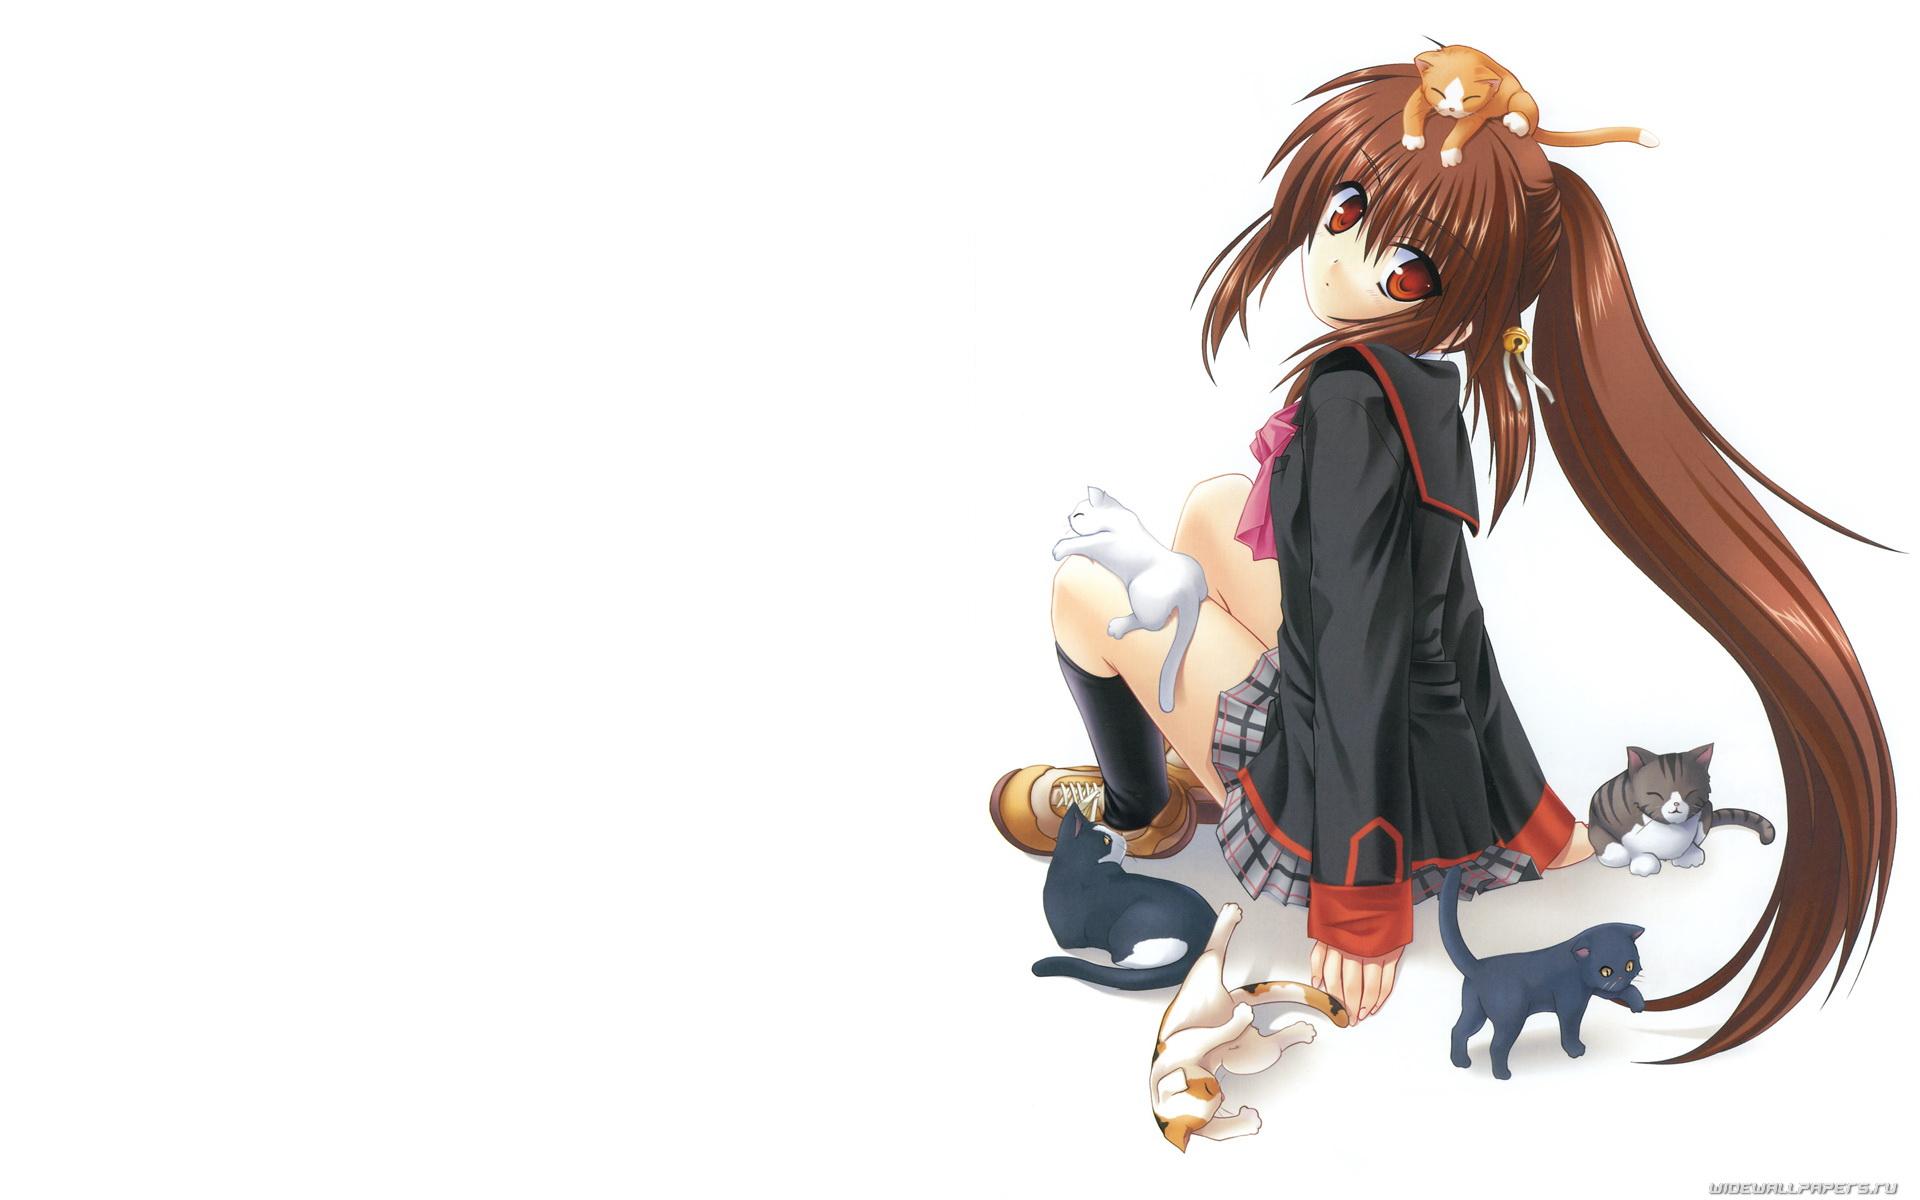 Image De Profil Manga Girl Cat